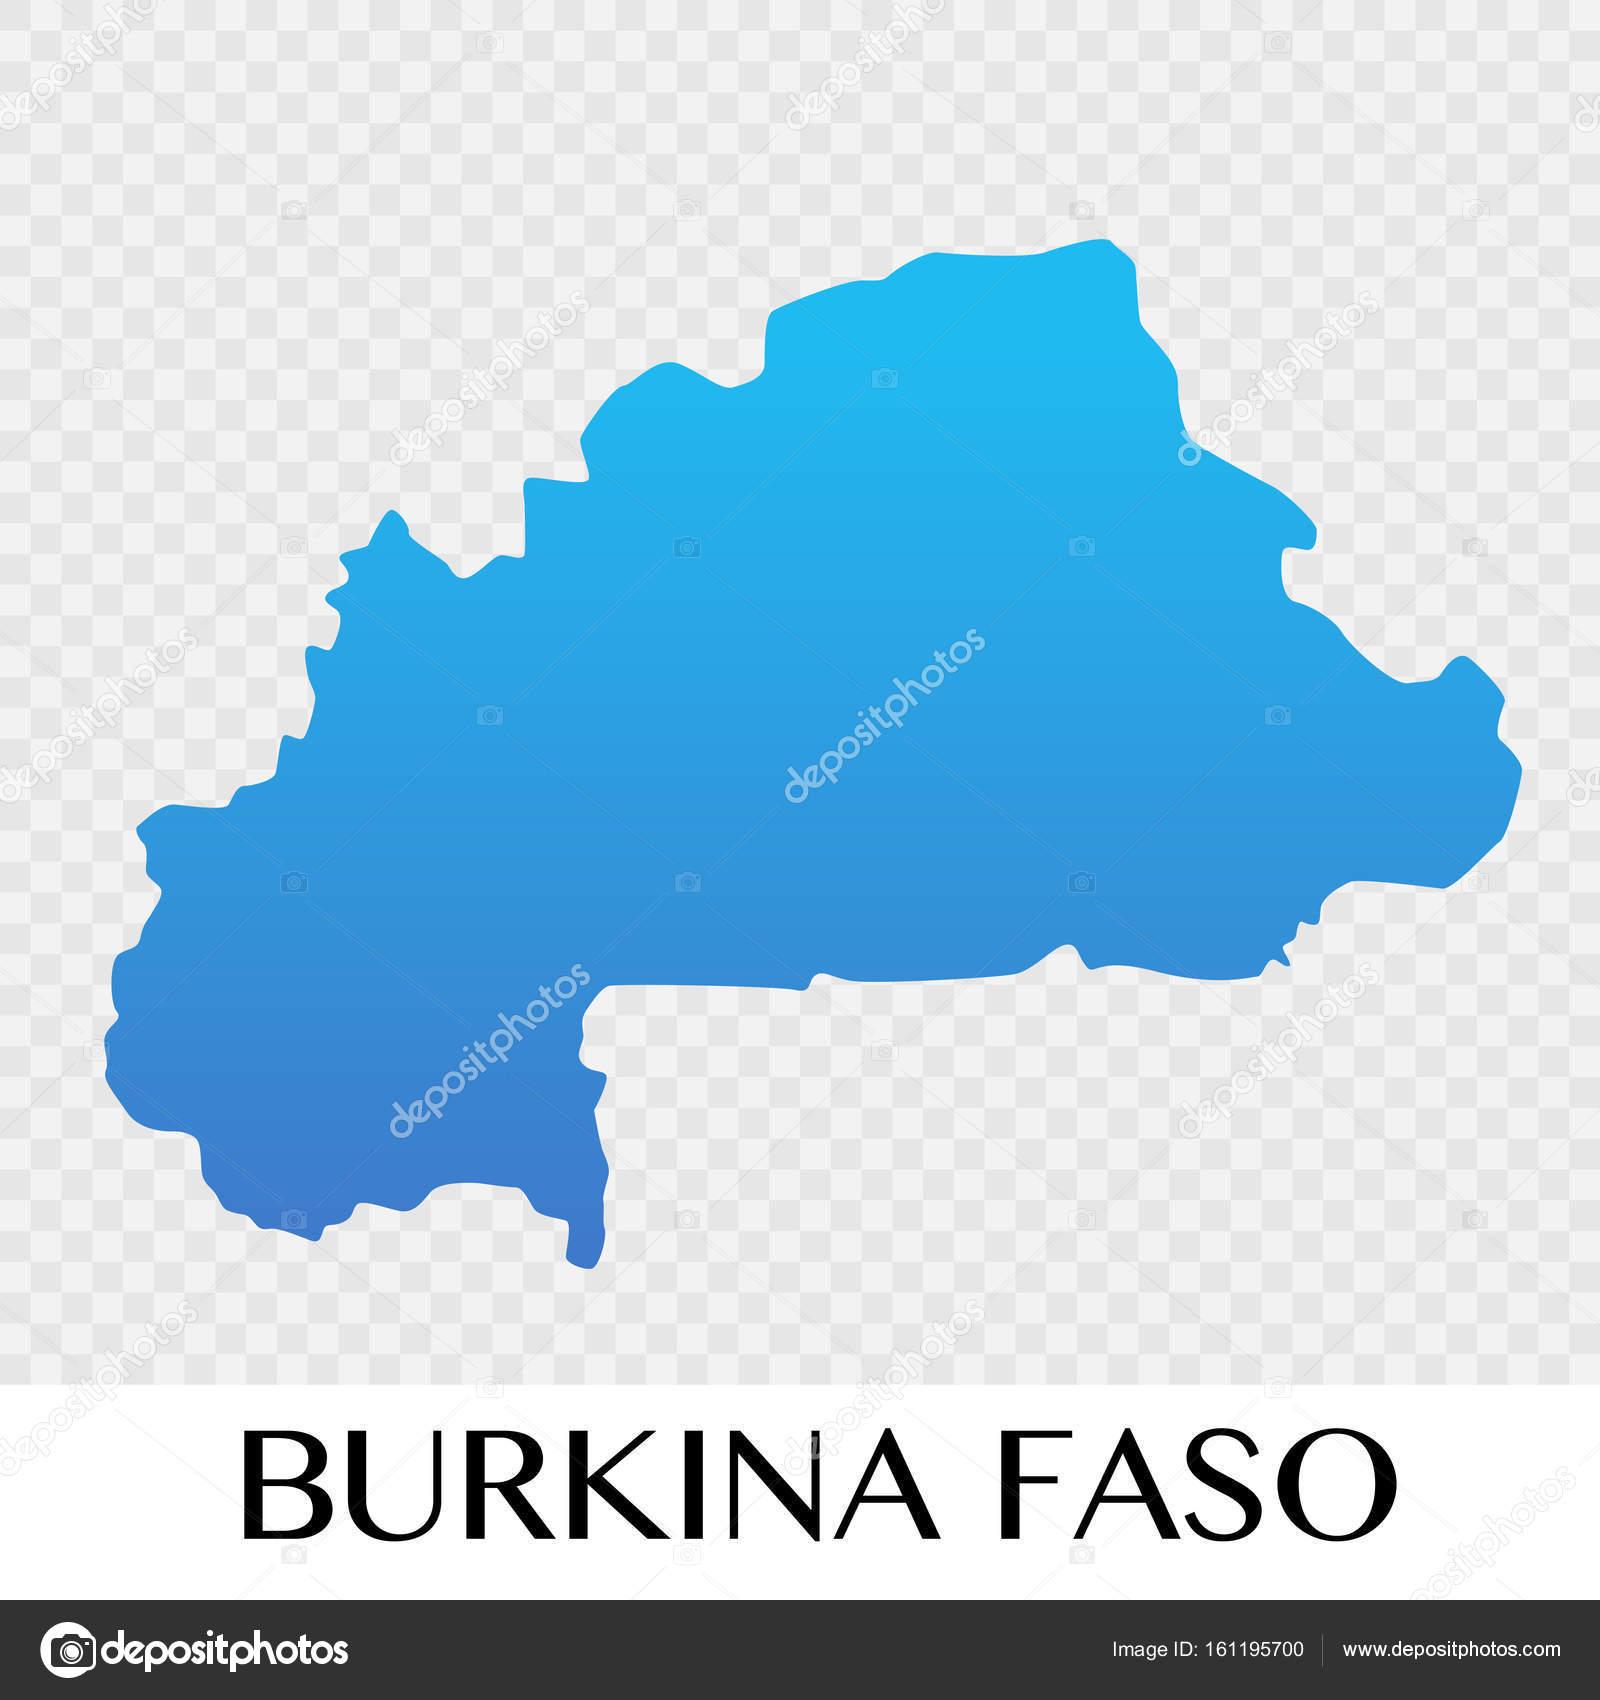 Burkina Faso Map In Africa Continent Illustration Design Stock